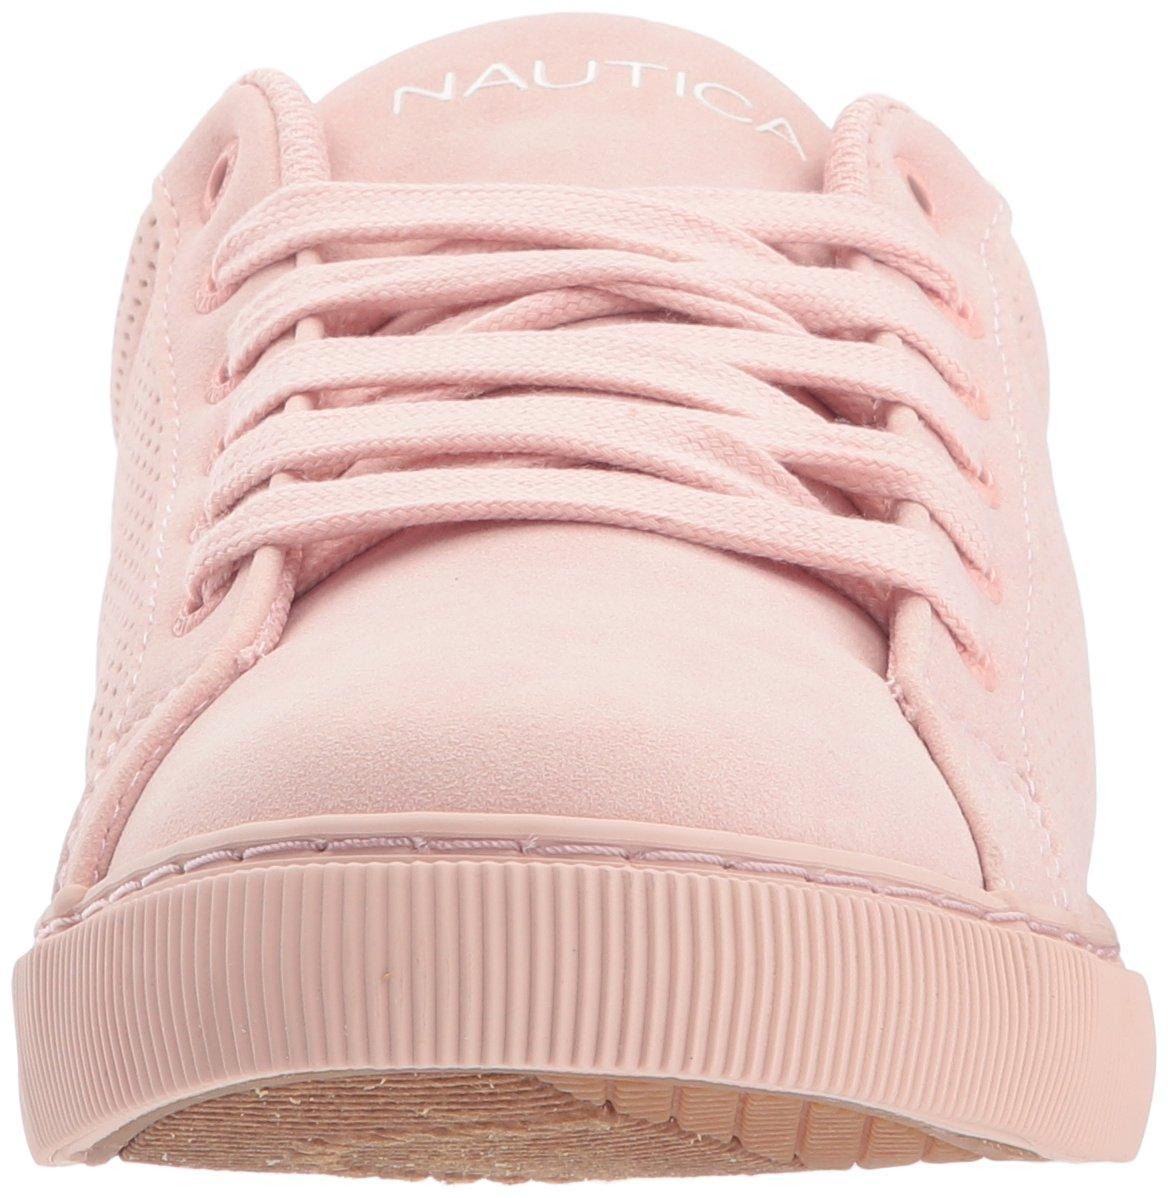 Nautica Women's Steam Sneaker Pink B071D1WH8X 6.5 B(M) US|Mineral Pink Sneaker Mono e487f3